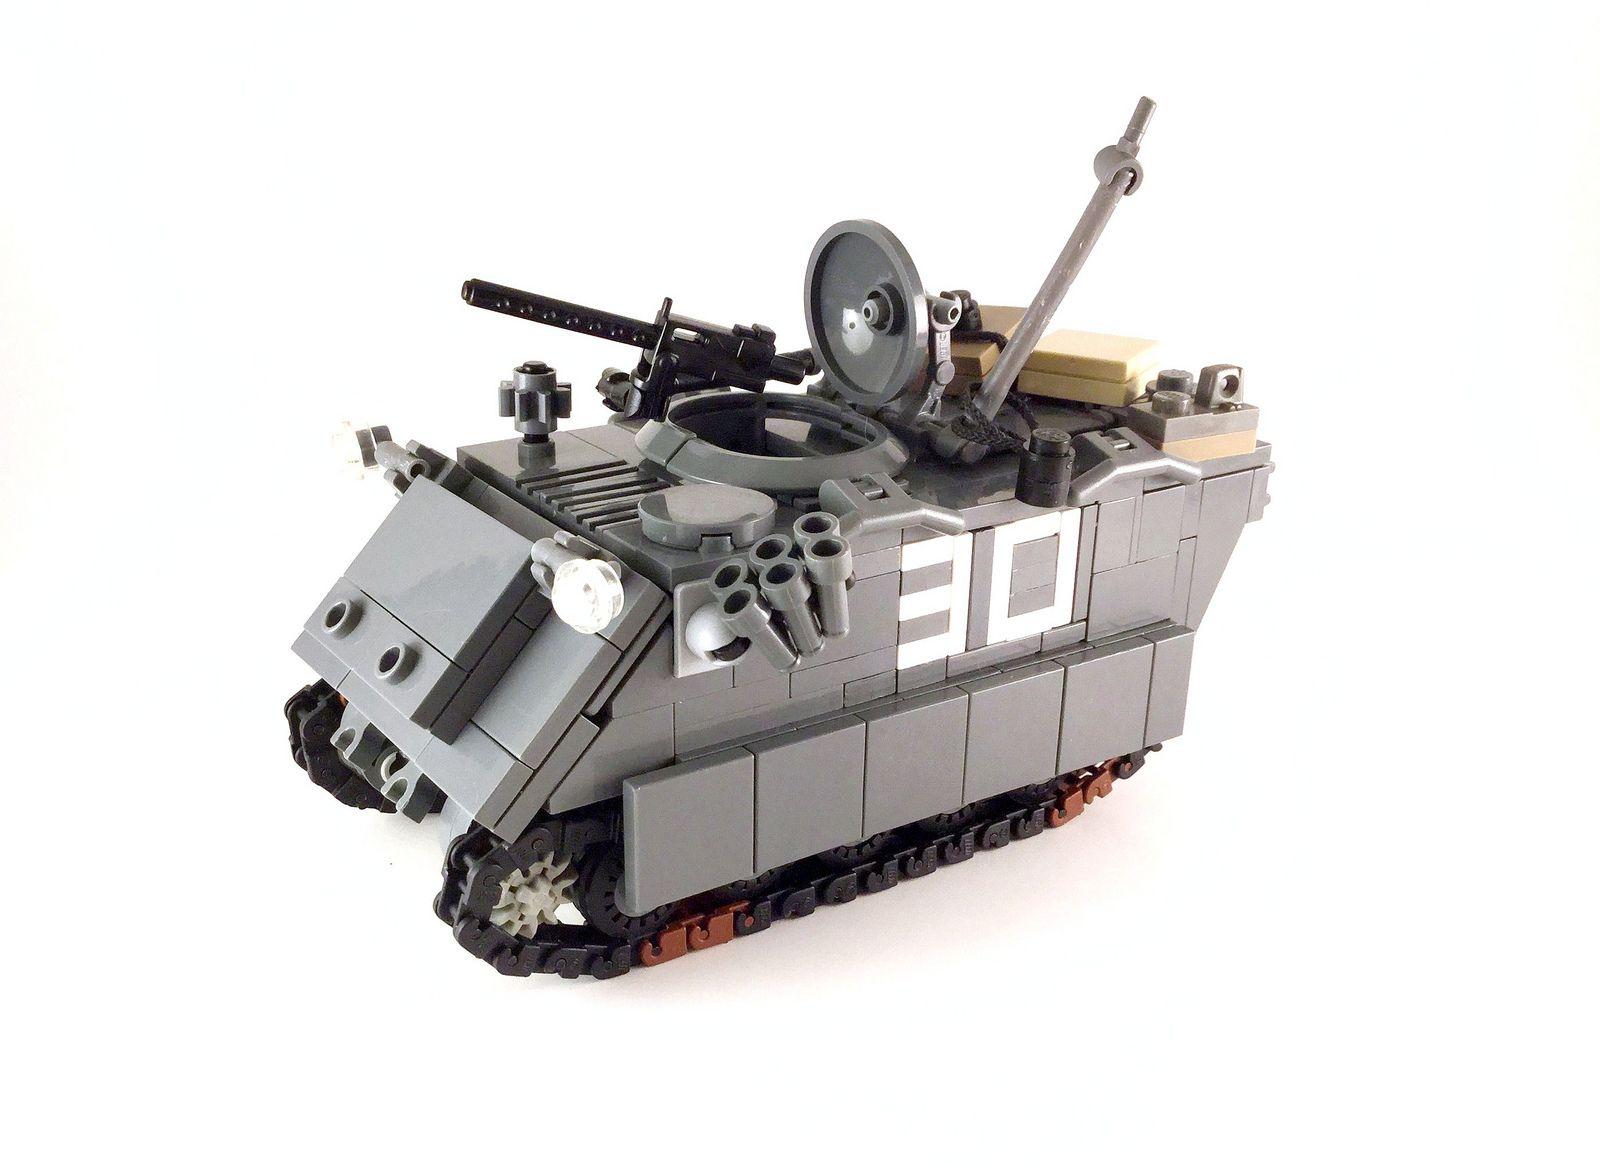 M113 APC - 01 | lego Militär, Lego und Militär